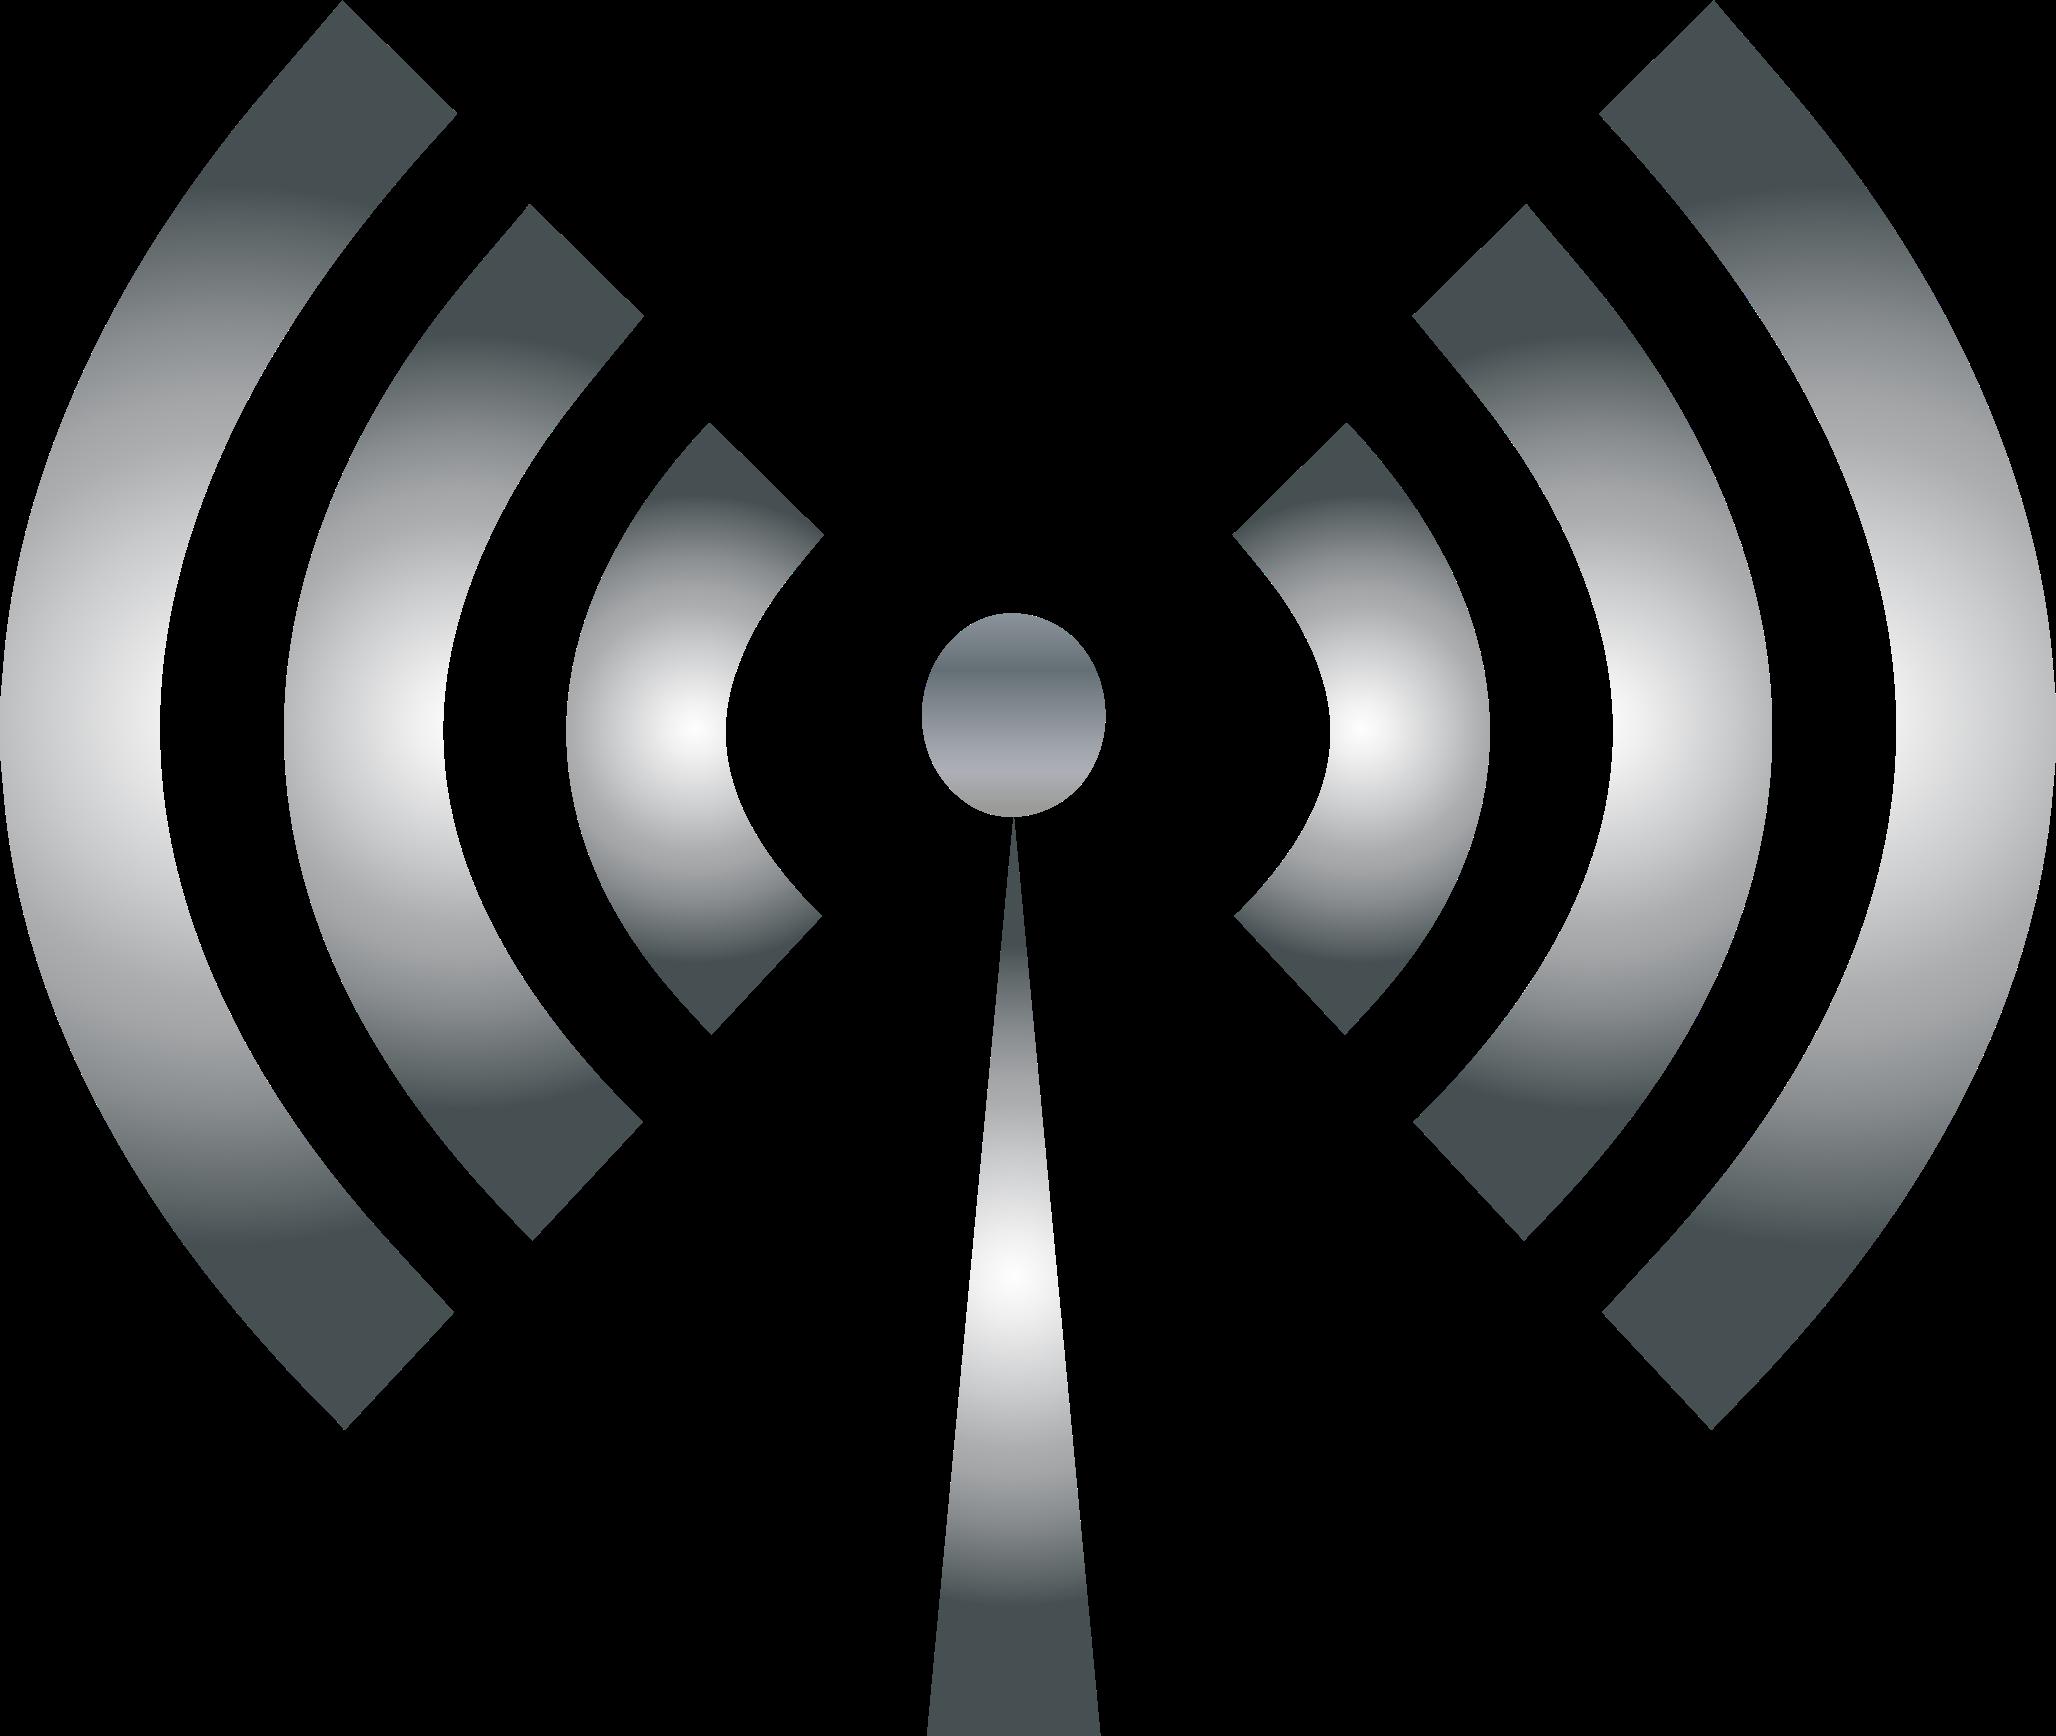 Internet clipart antenna. Metallic big image png